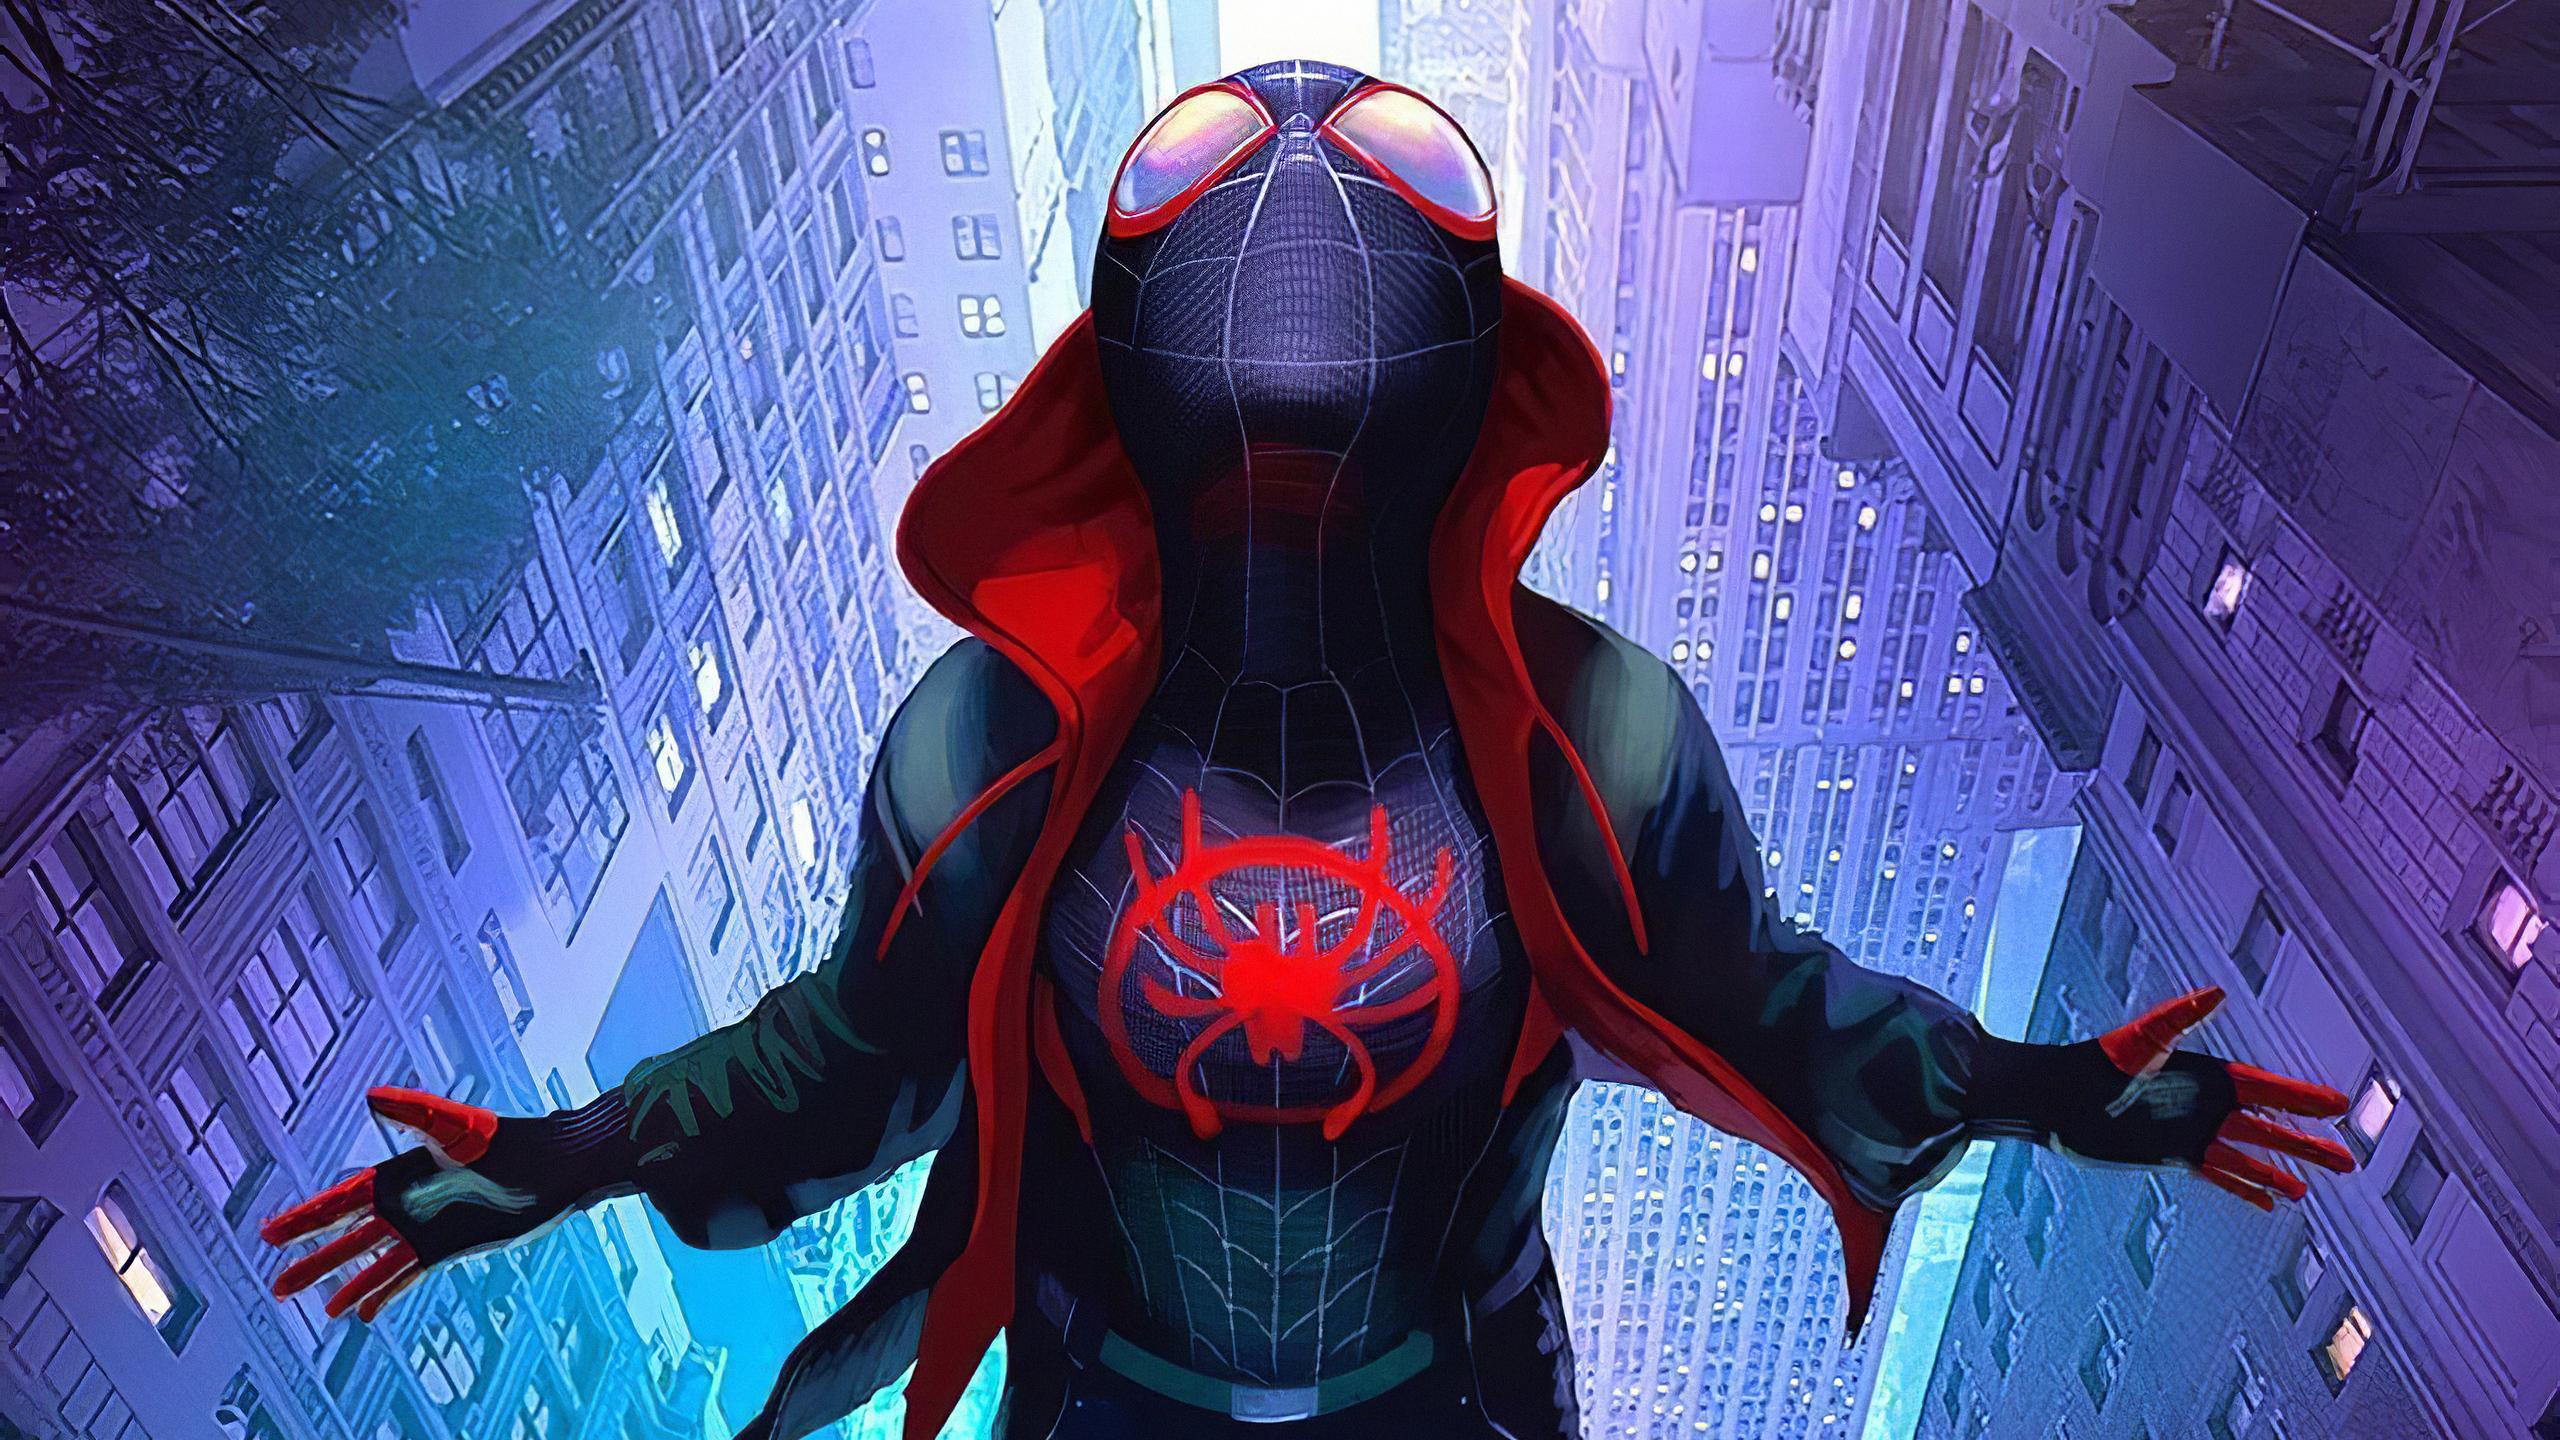 2560x1440 Artwork Spiderman Miles Morales 1440P Resolution ...